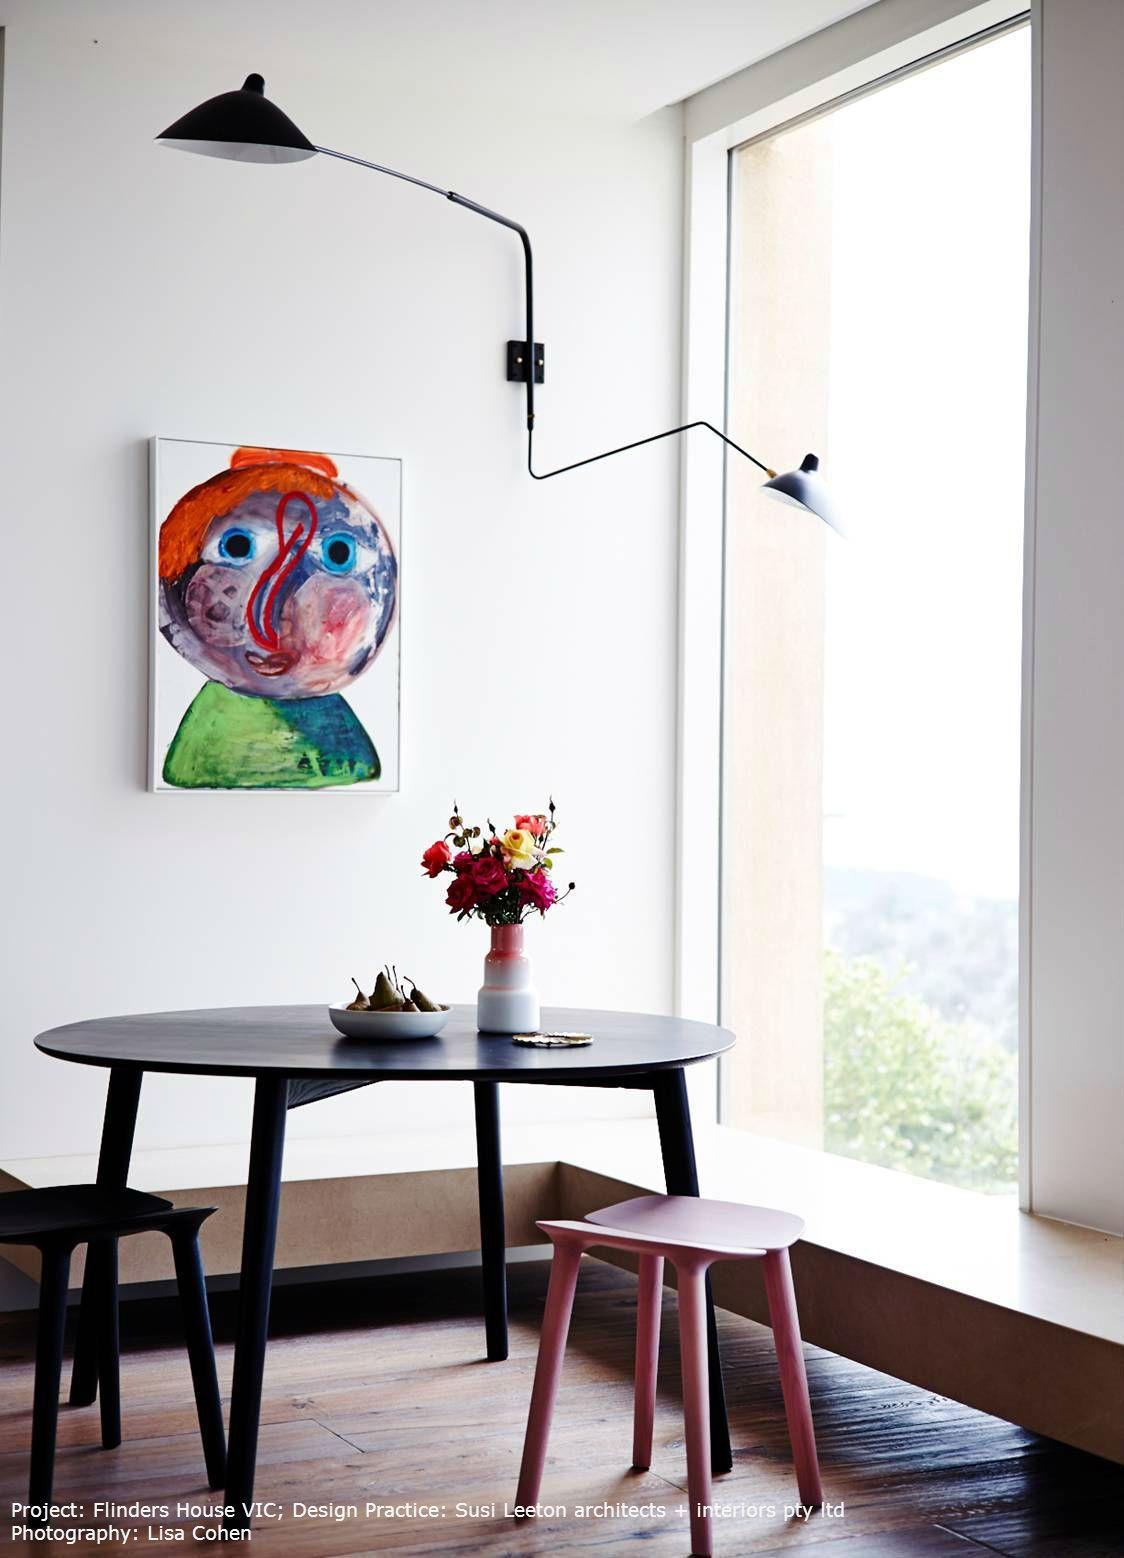 Jelanie Blog Flinders House By Susi Leeton Architects  # Muebles Carreiro